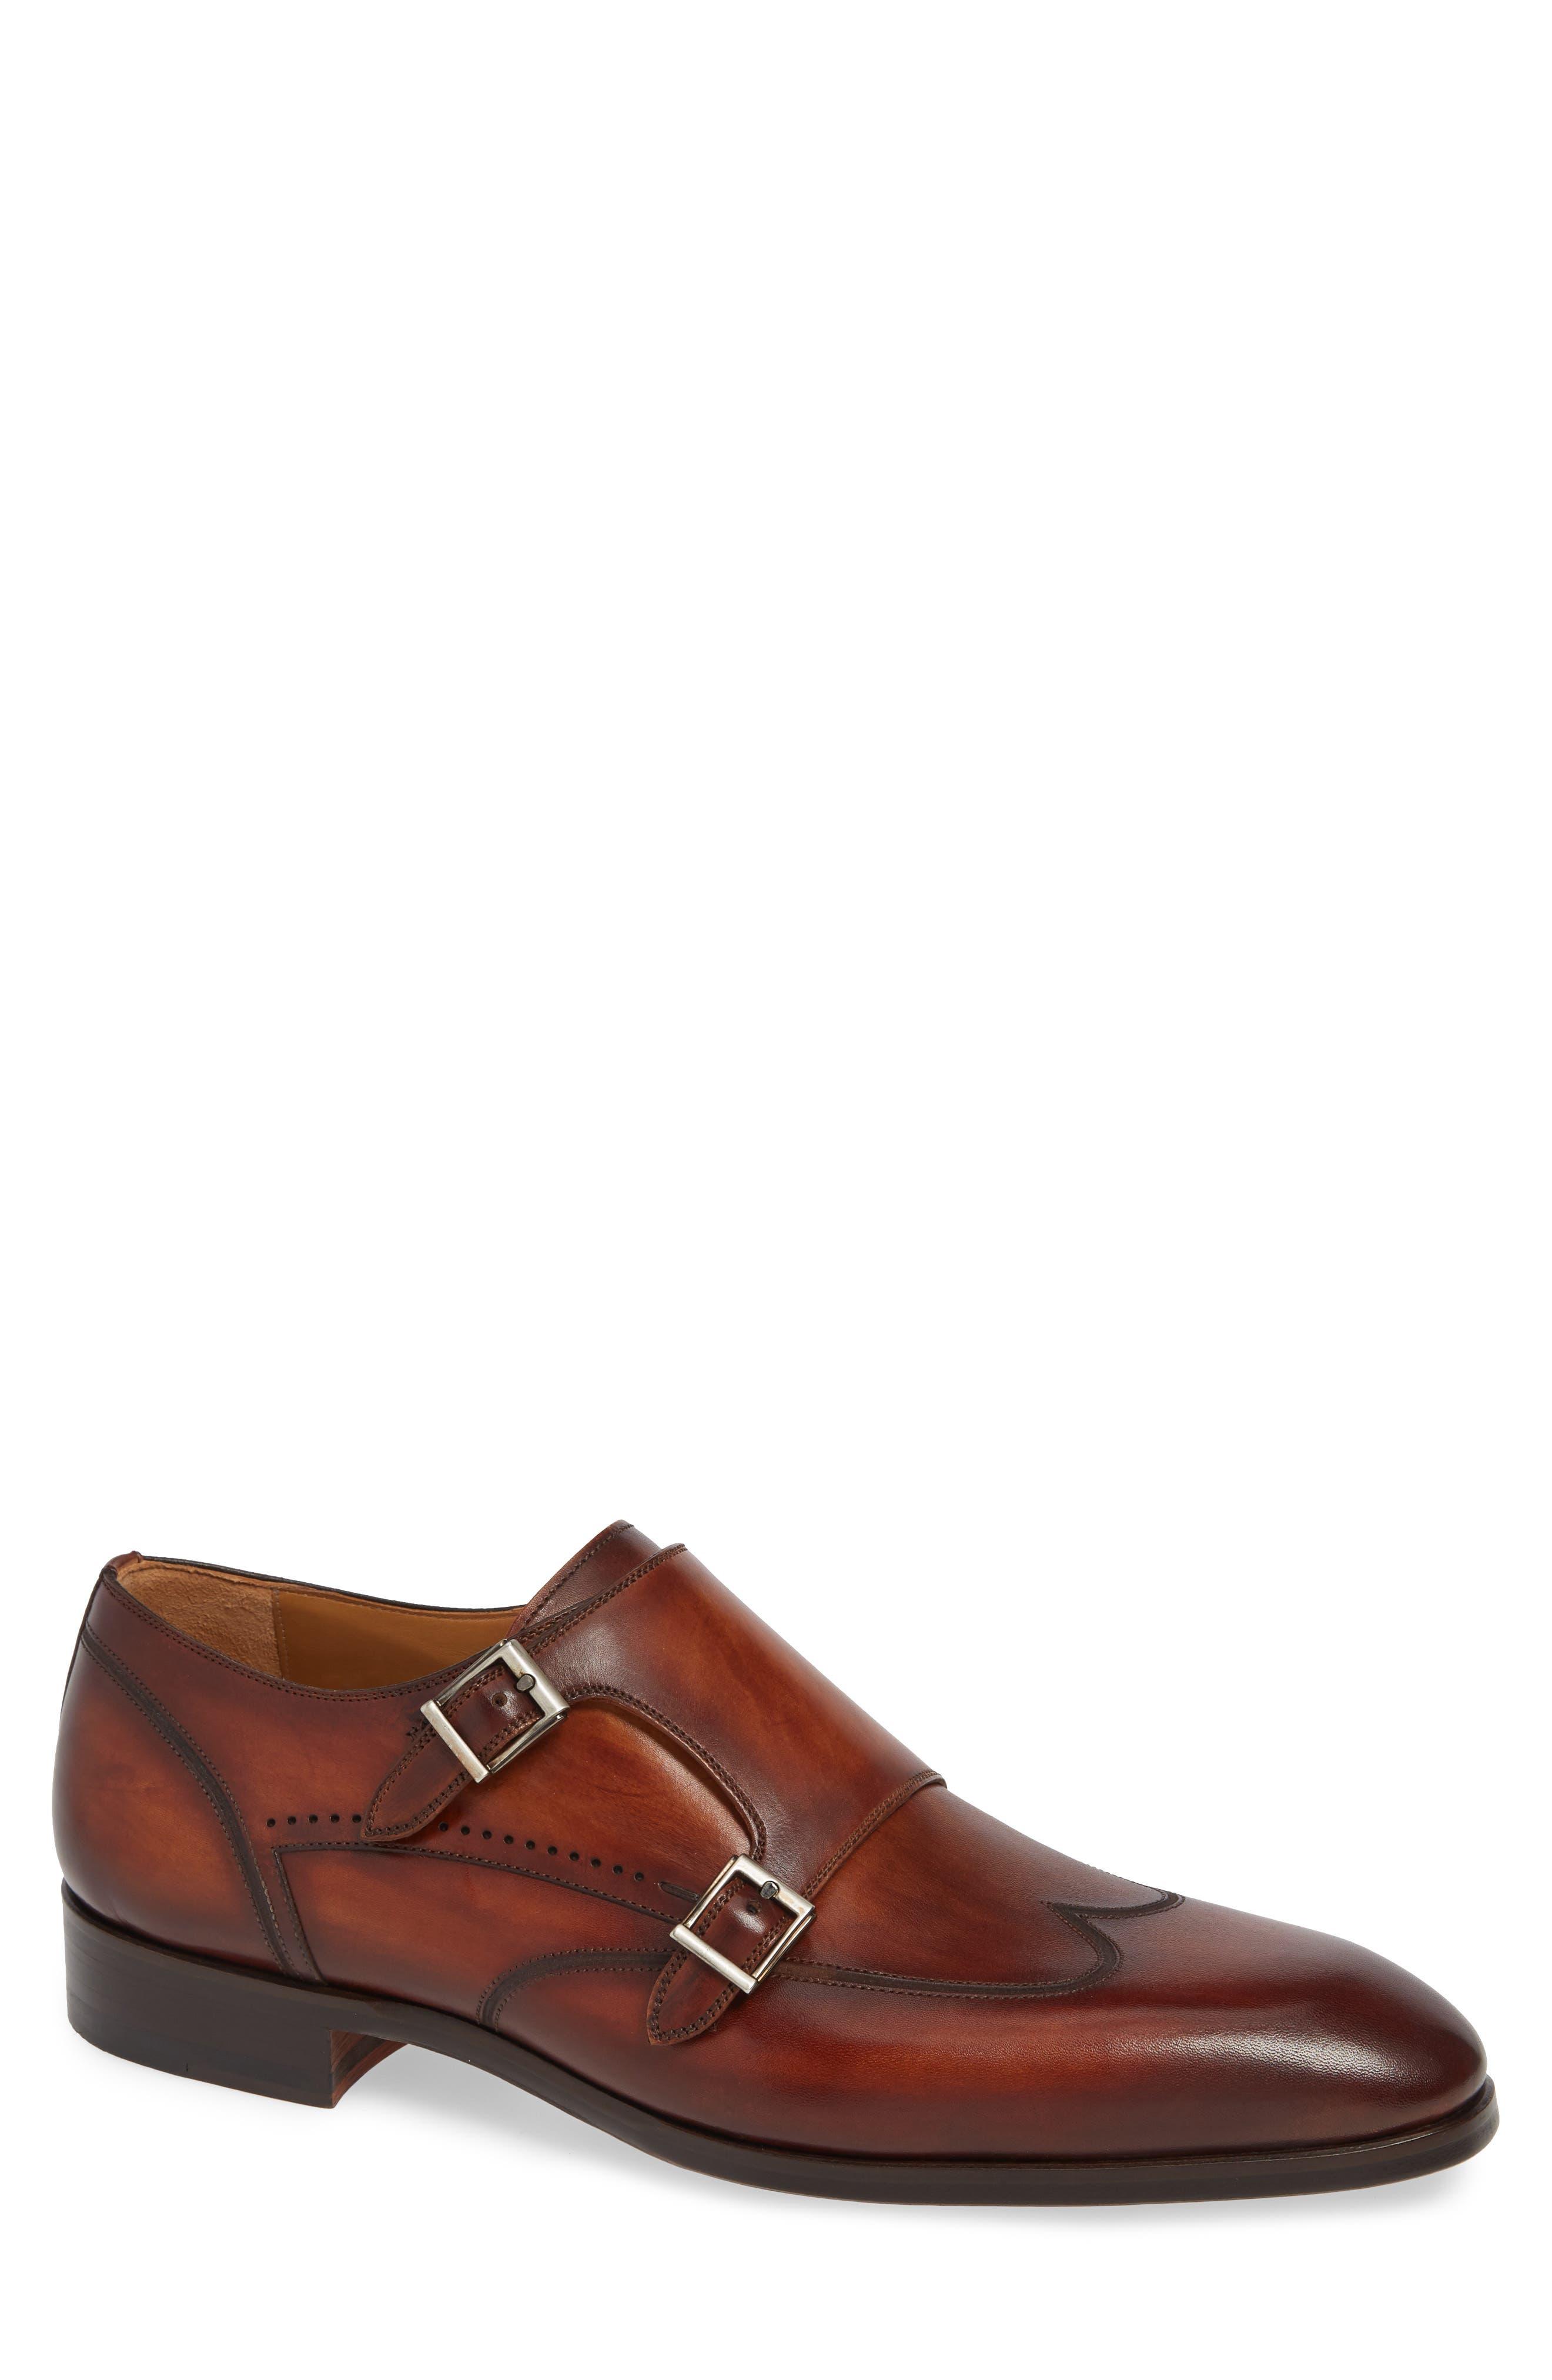 Camden Double Monk Strap Shoe,                             Main thumbnail 1, color,                             202